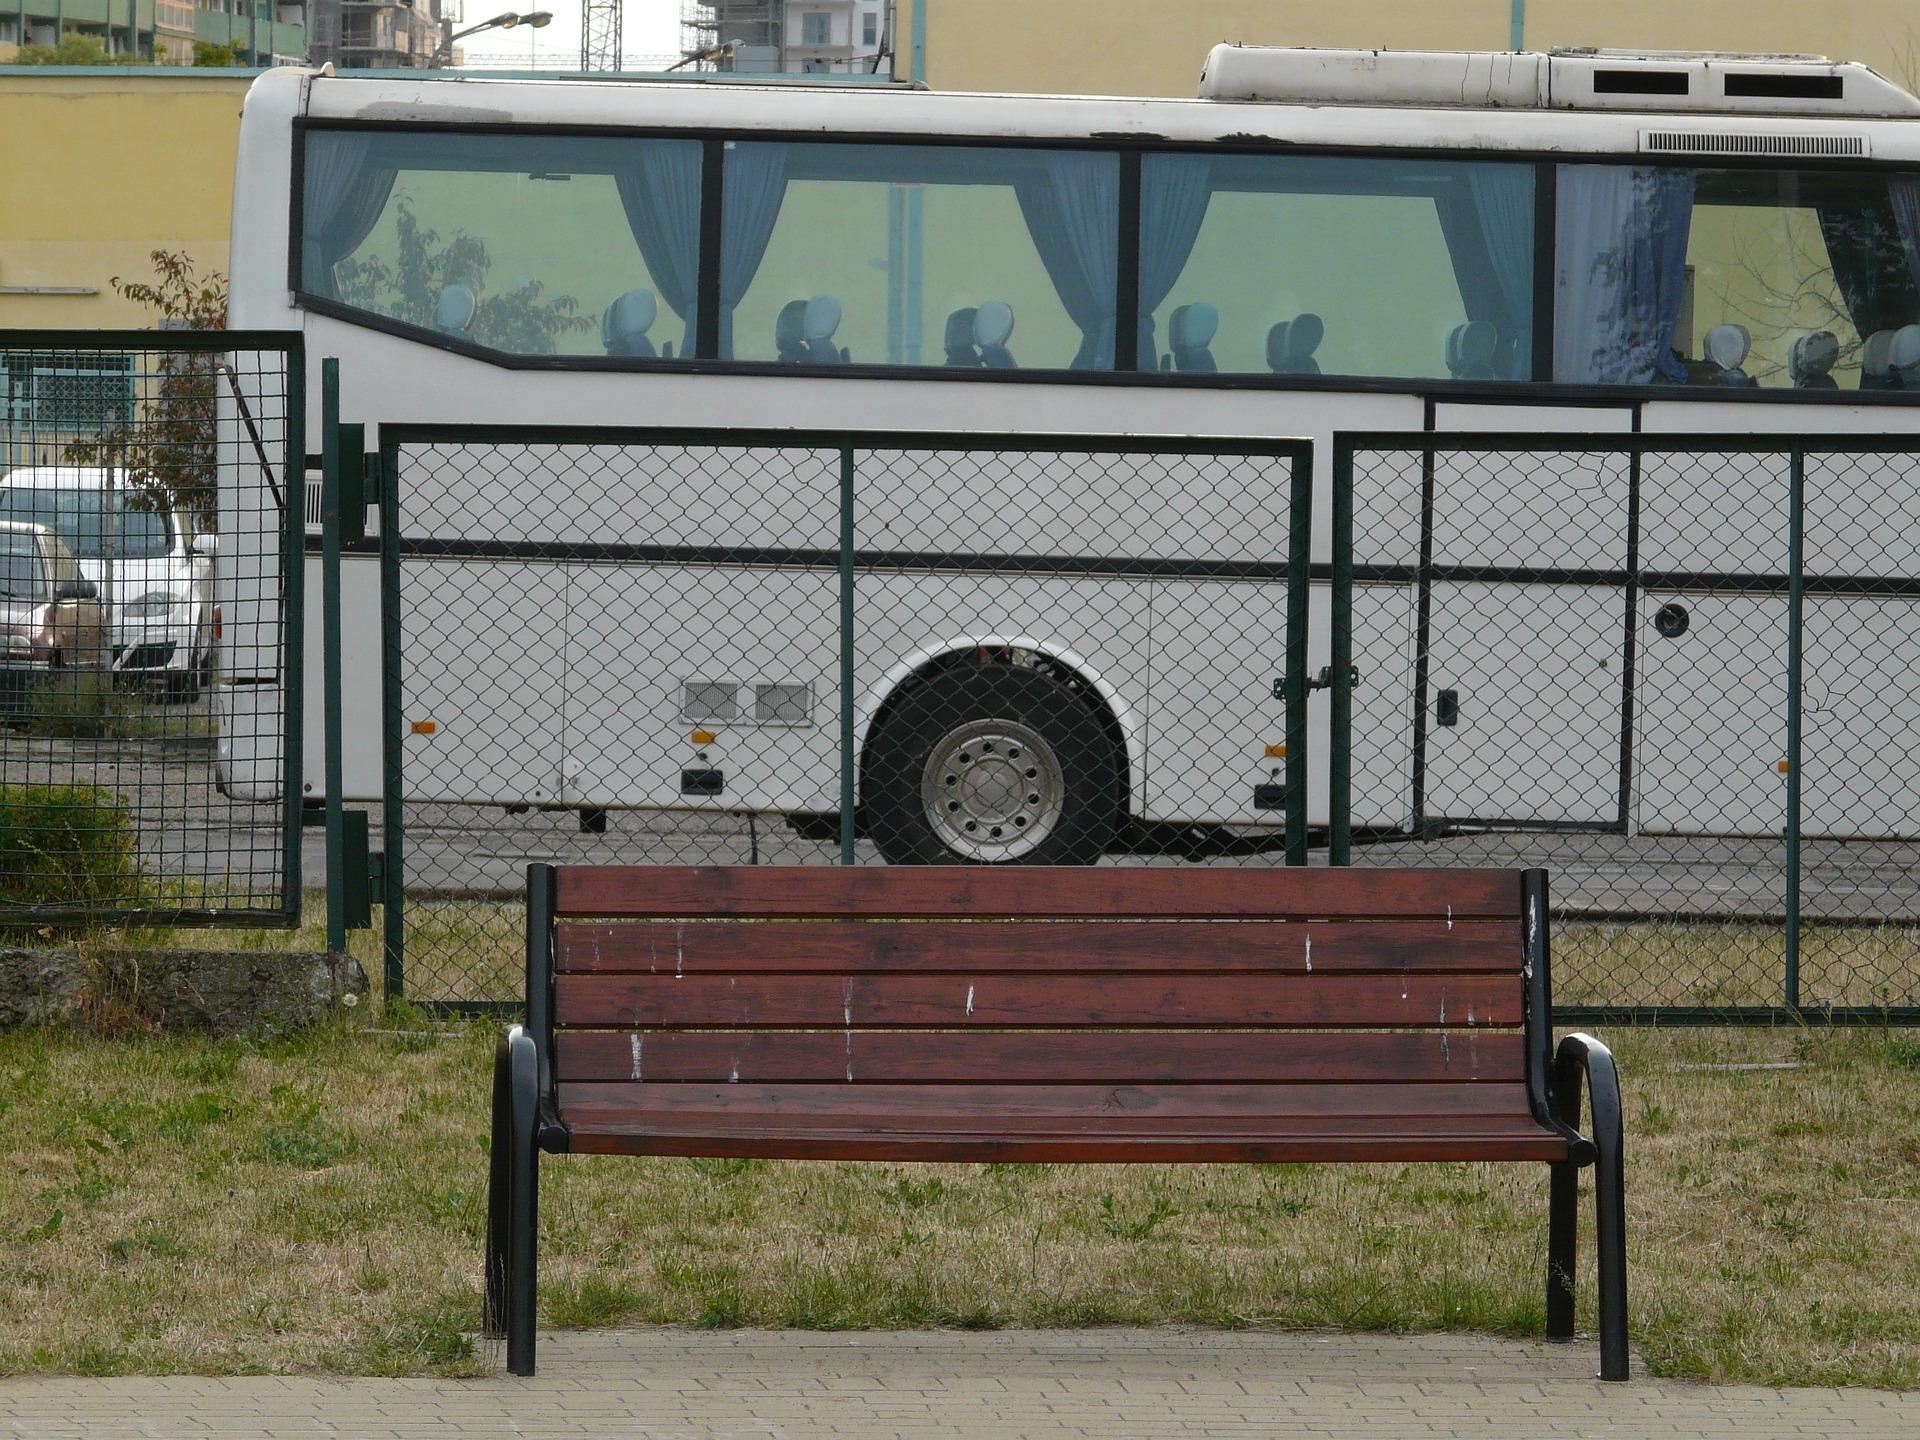 coach-986078_1920